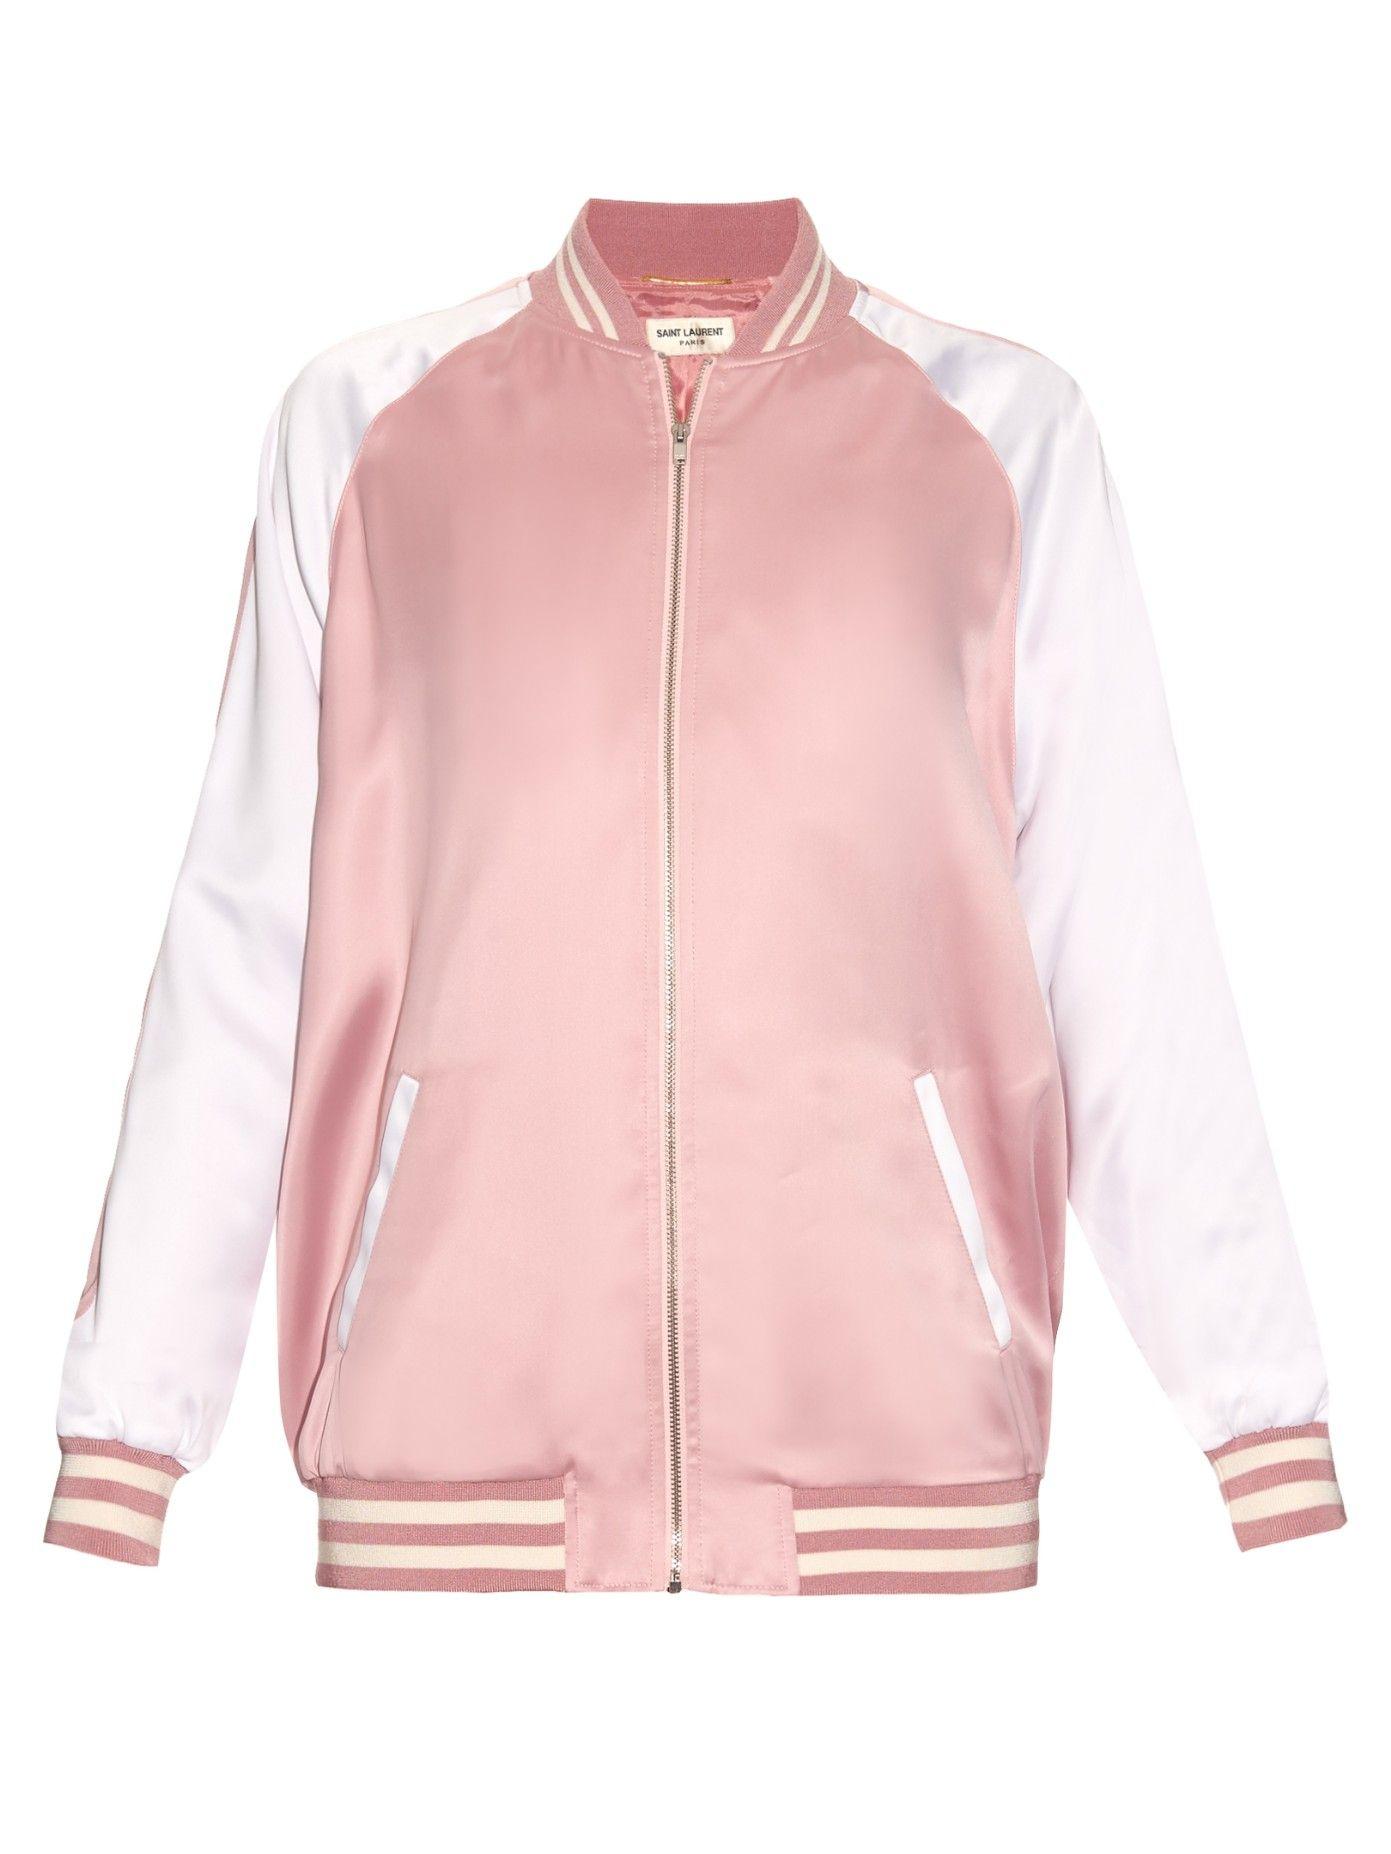 Satin Bomber Jacket Saint Laurent Matchesfashion Us Clothes Clothes Design Pink Bomber Jacket [ 1854 x 1391 Pixel ]